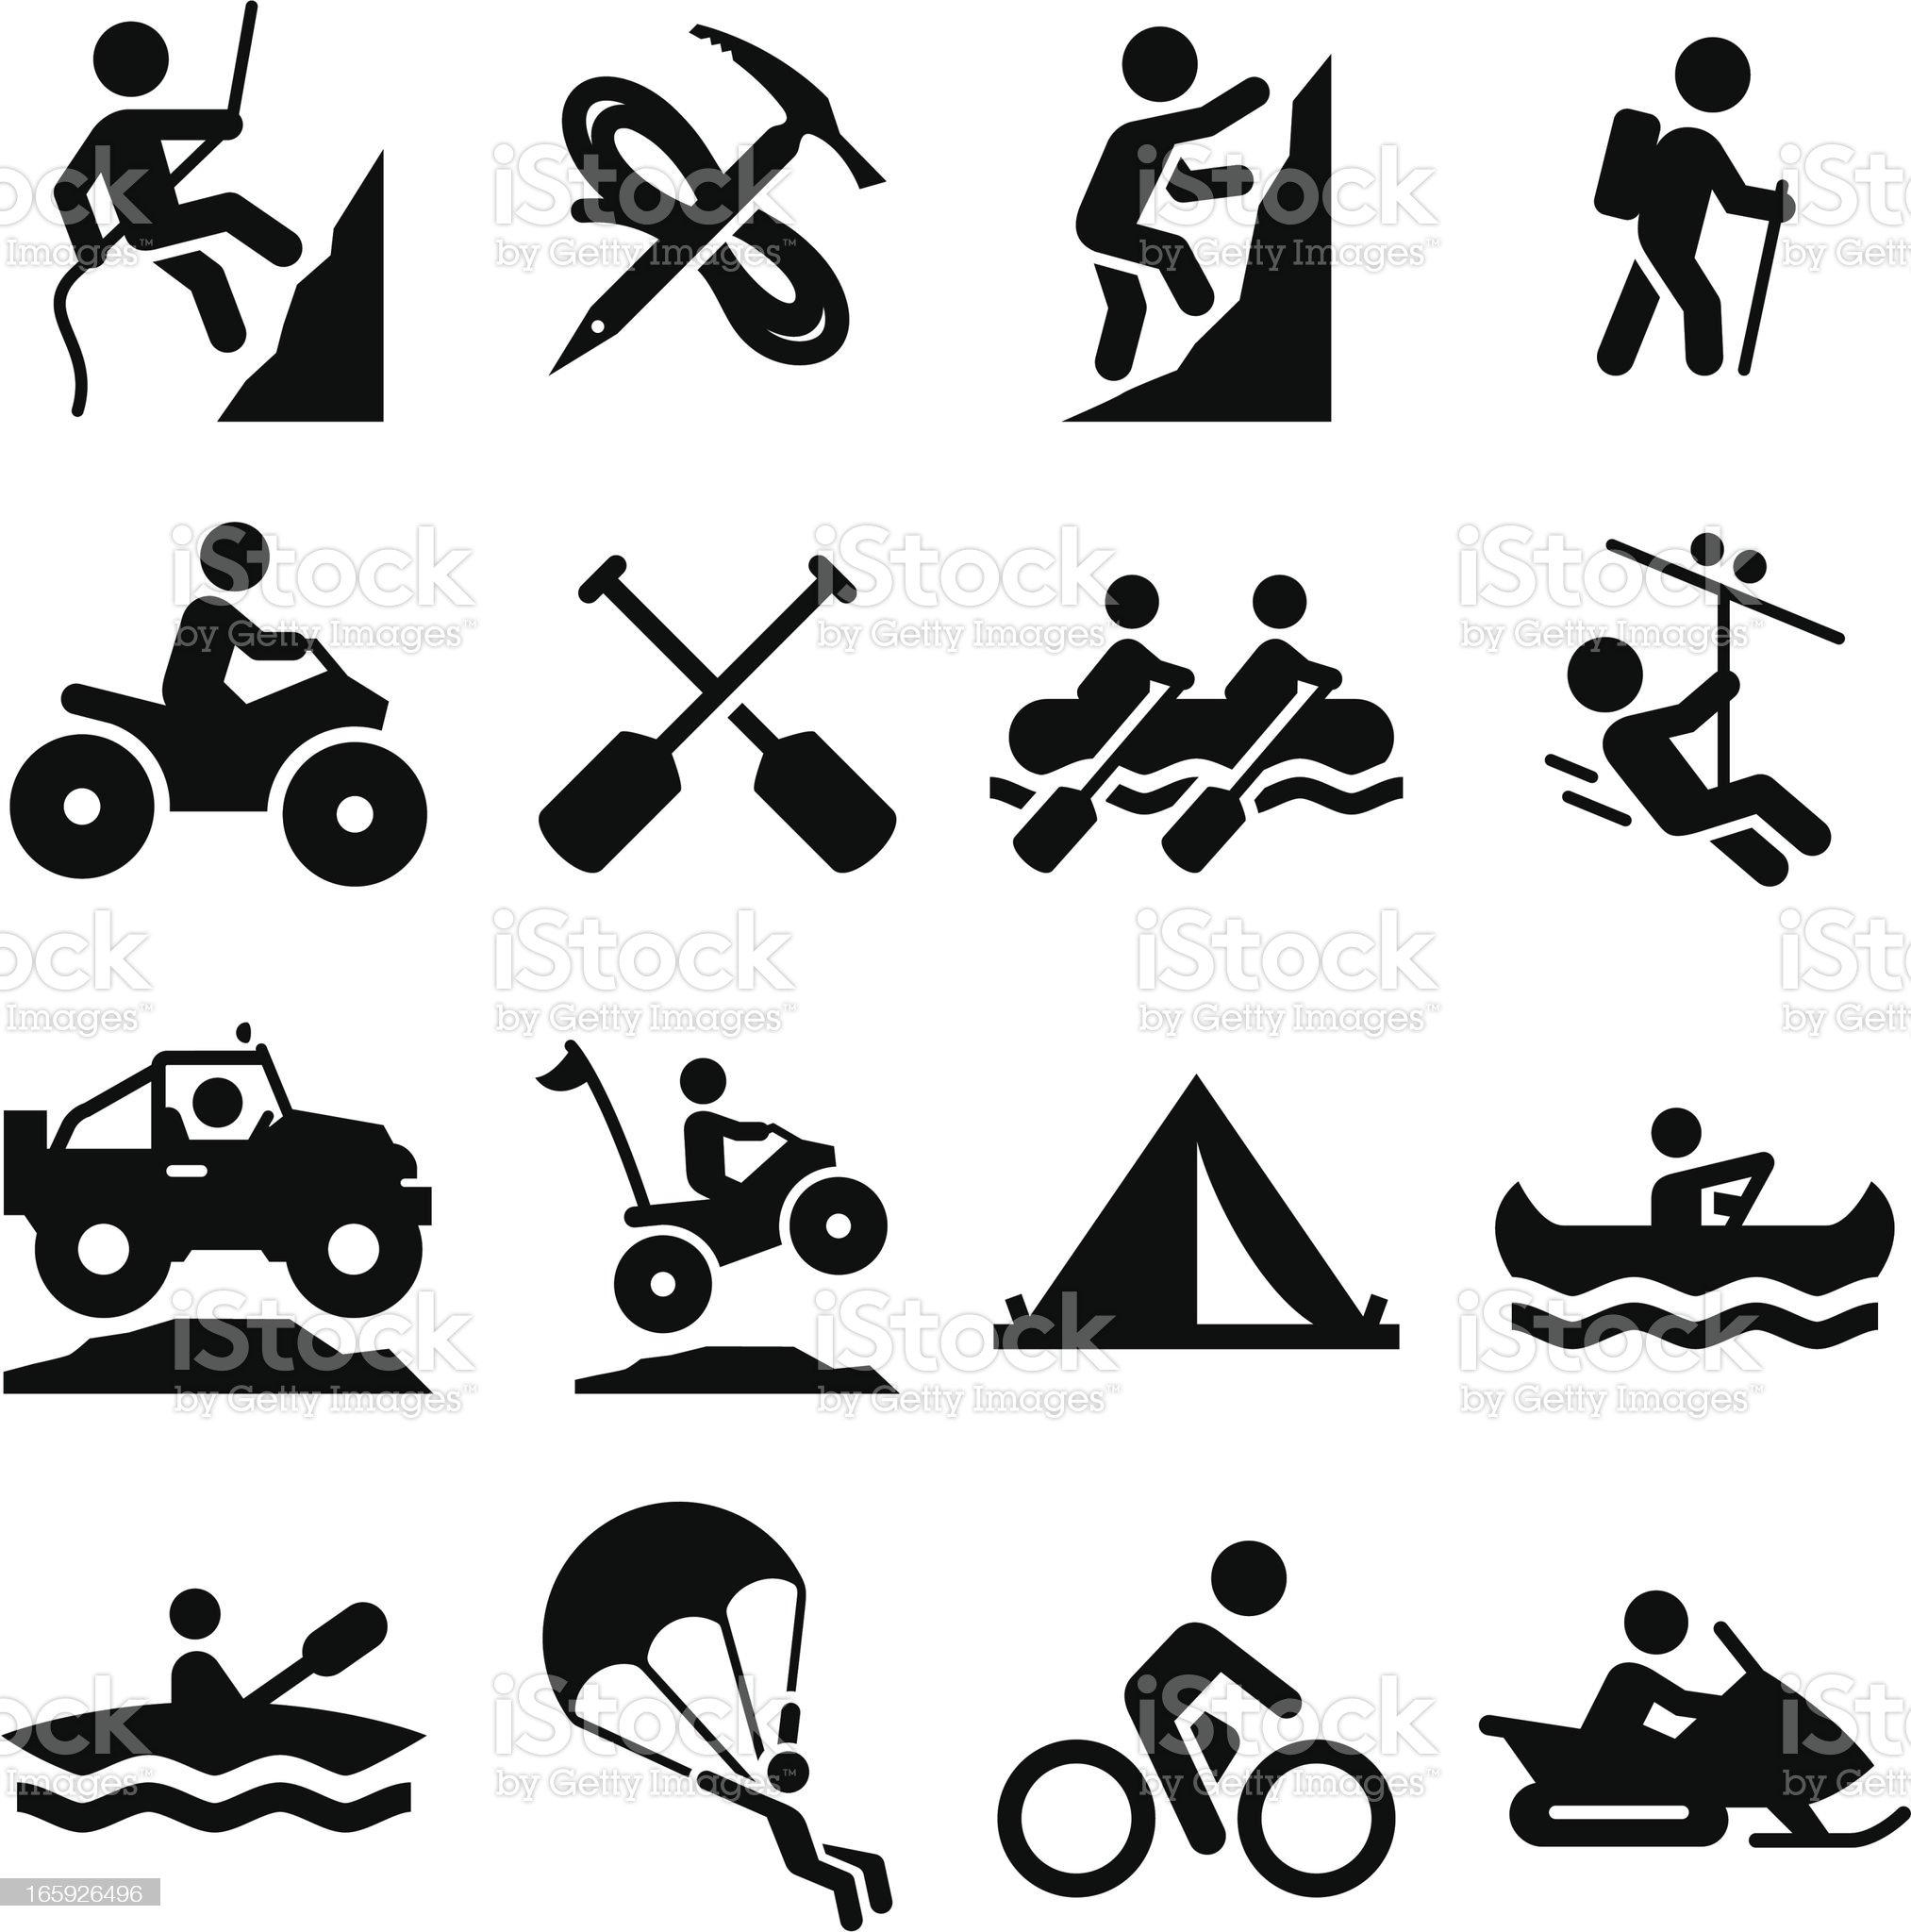 Adventure Sports Icons - Black Series royalty-free stock vector art